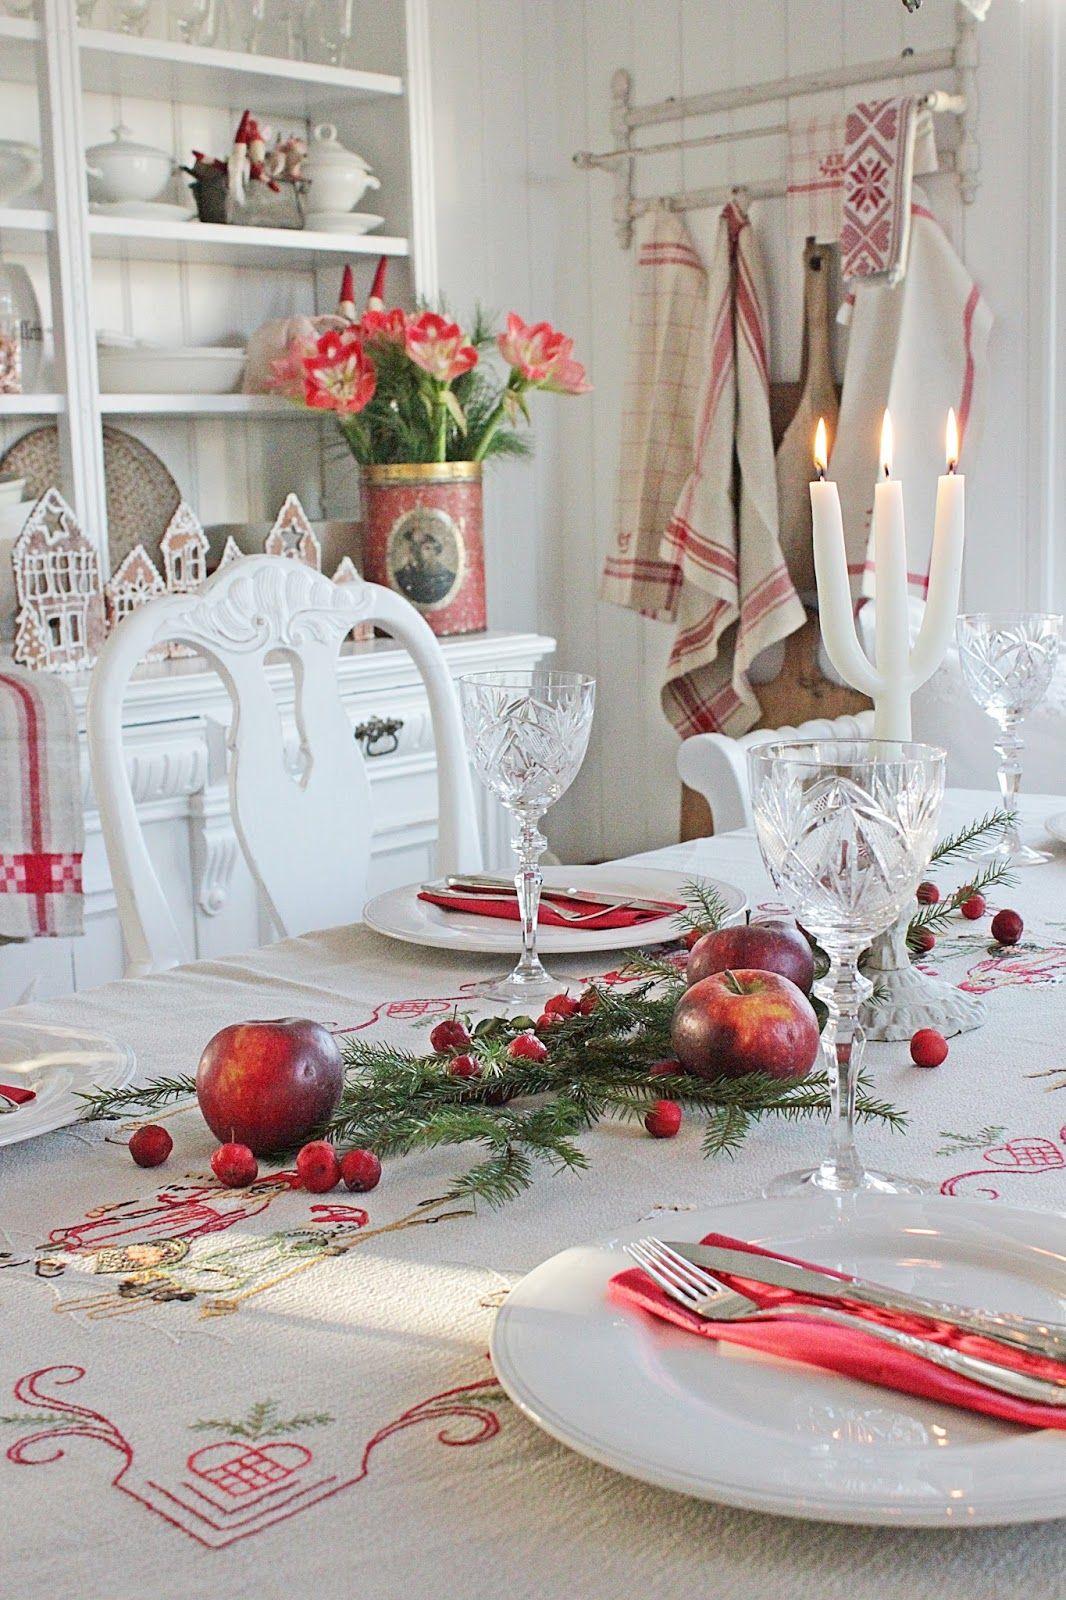 Scandinavian Christmas tablescape · Christmas DesignChristmas Table Set UpChristmas ... & Scandinavian Christmas tablescape | Swedish Christmas | Pinterest ...